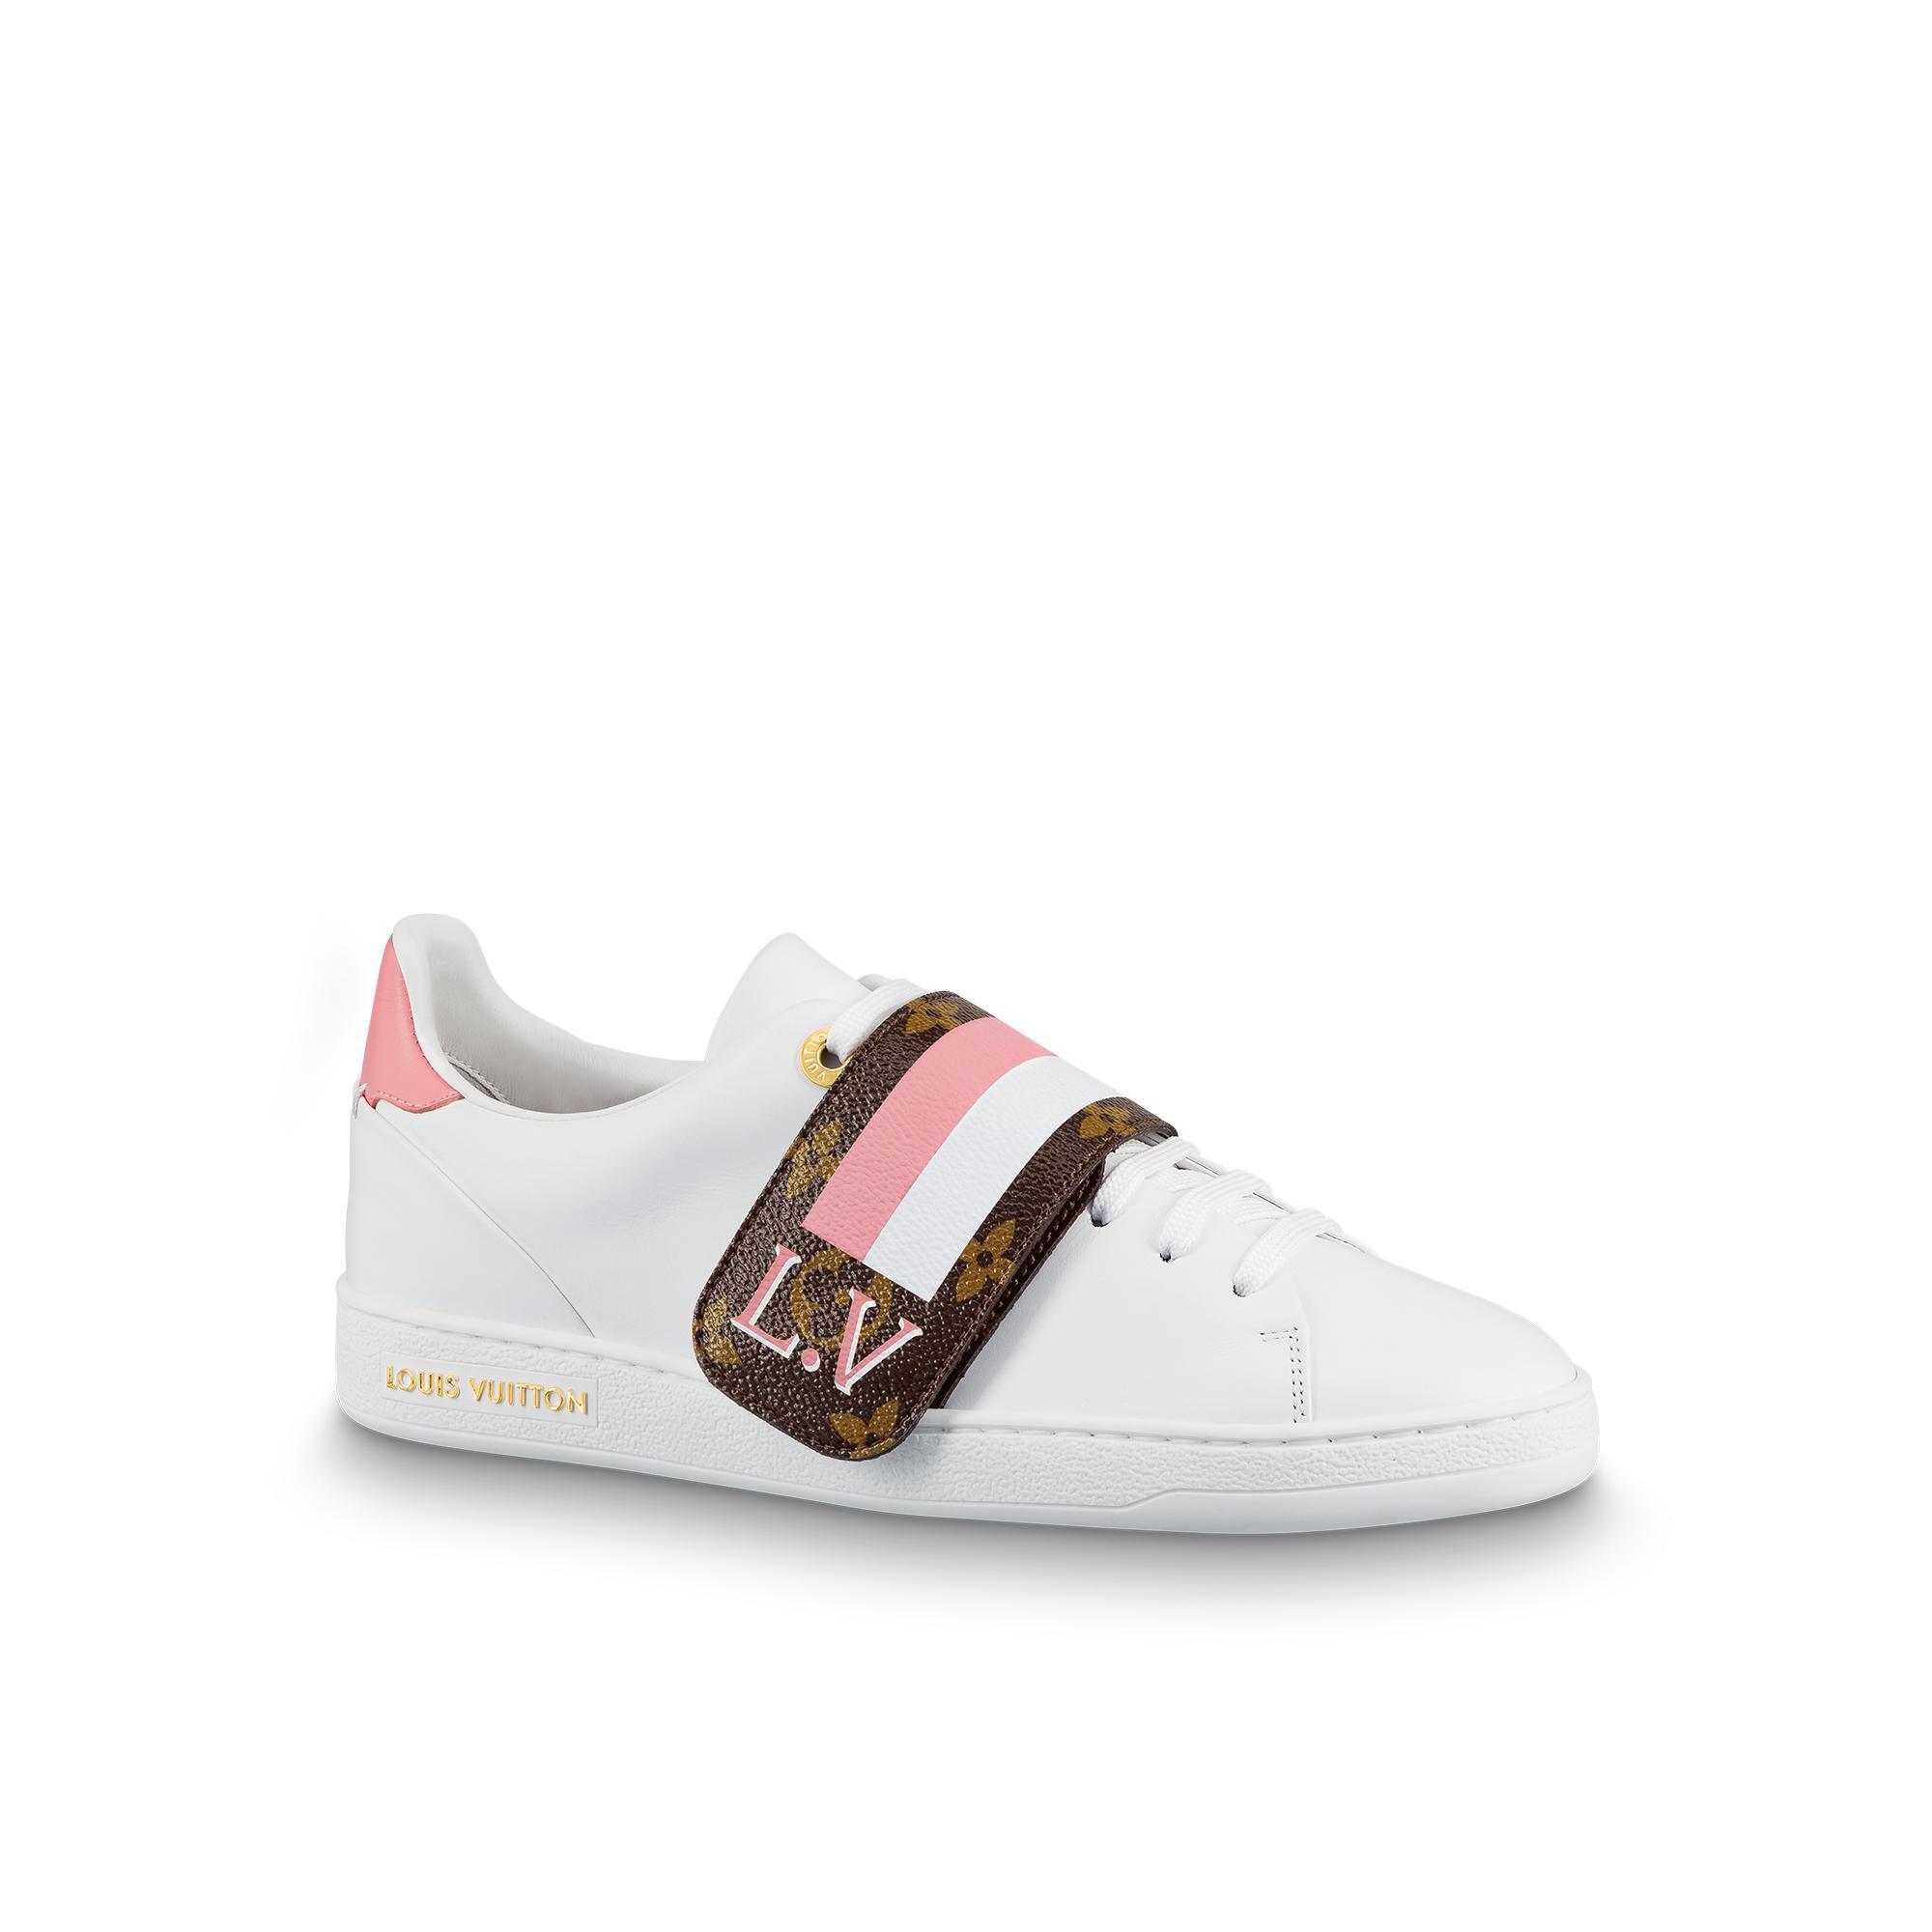 66ba34648742 Louis Vuitton Frontrow Sneaker